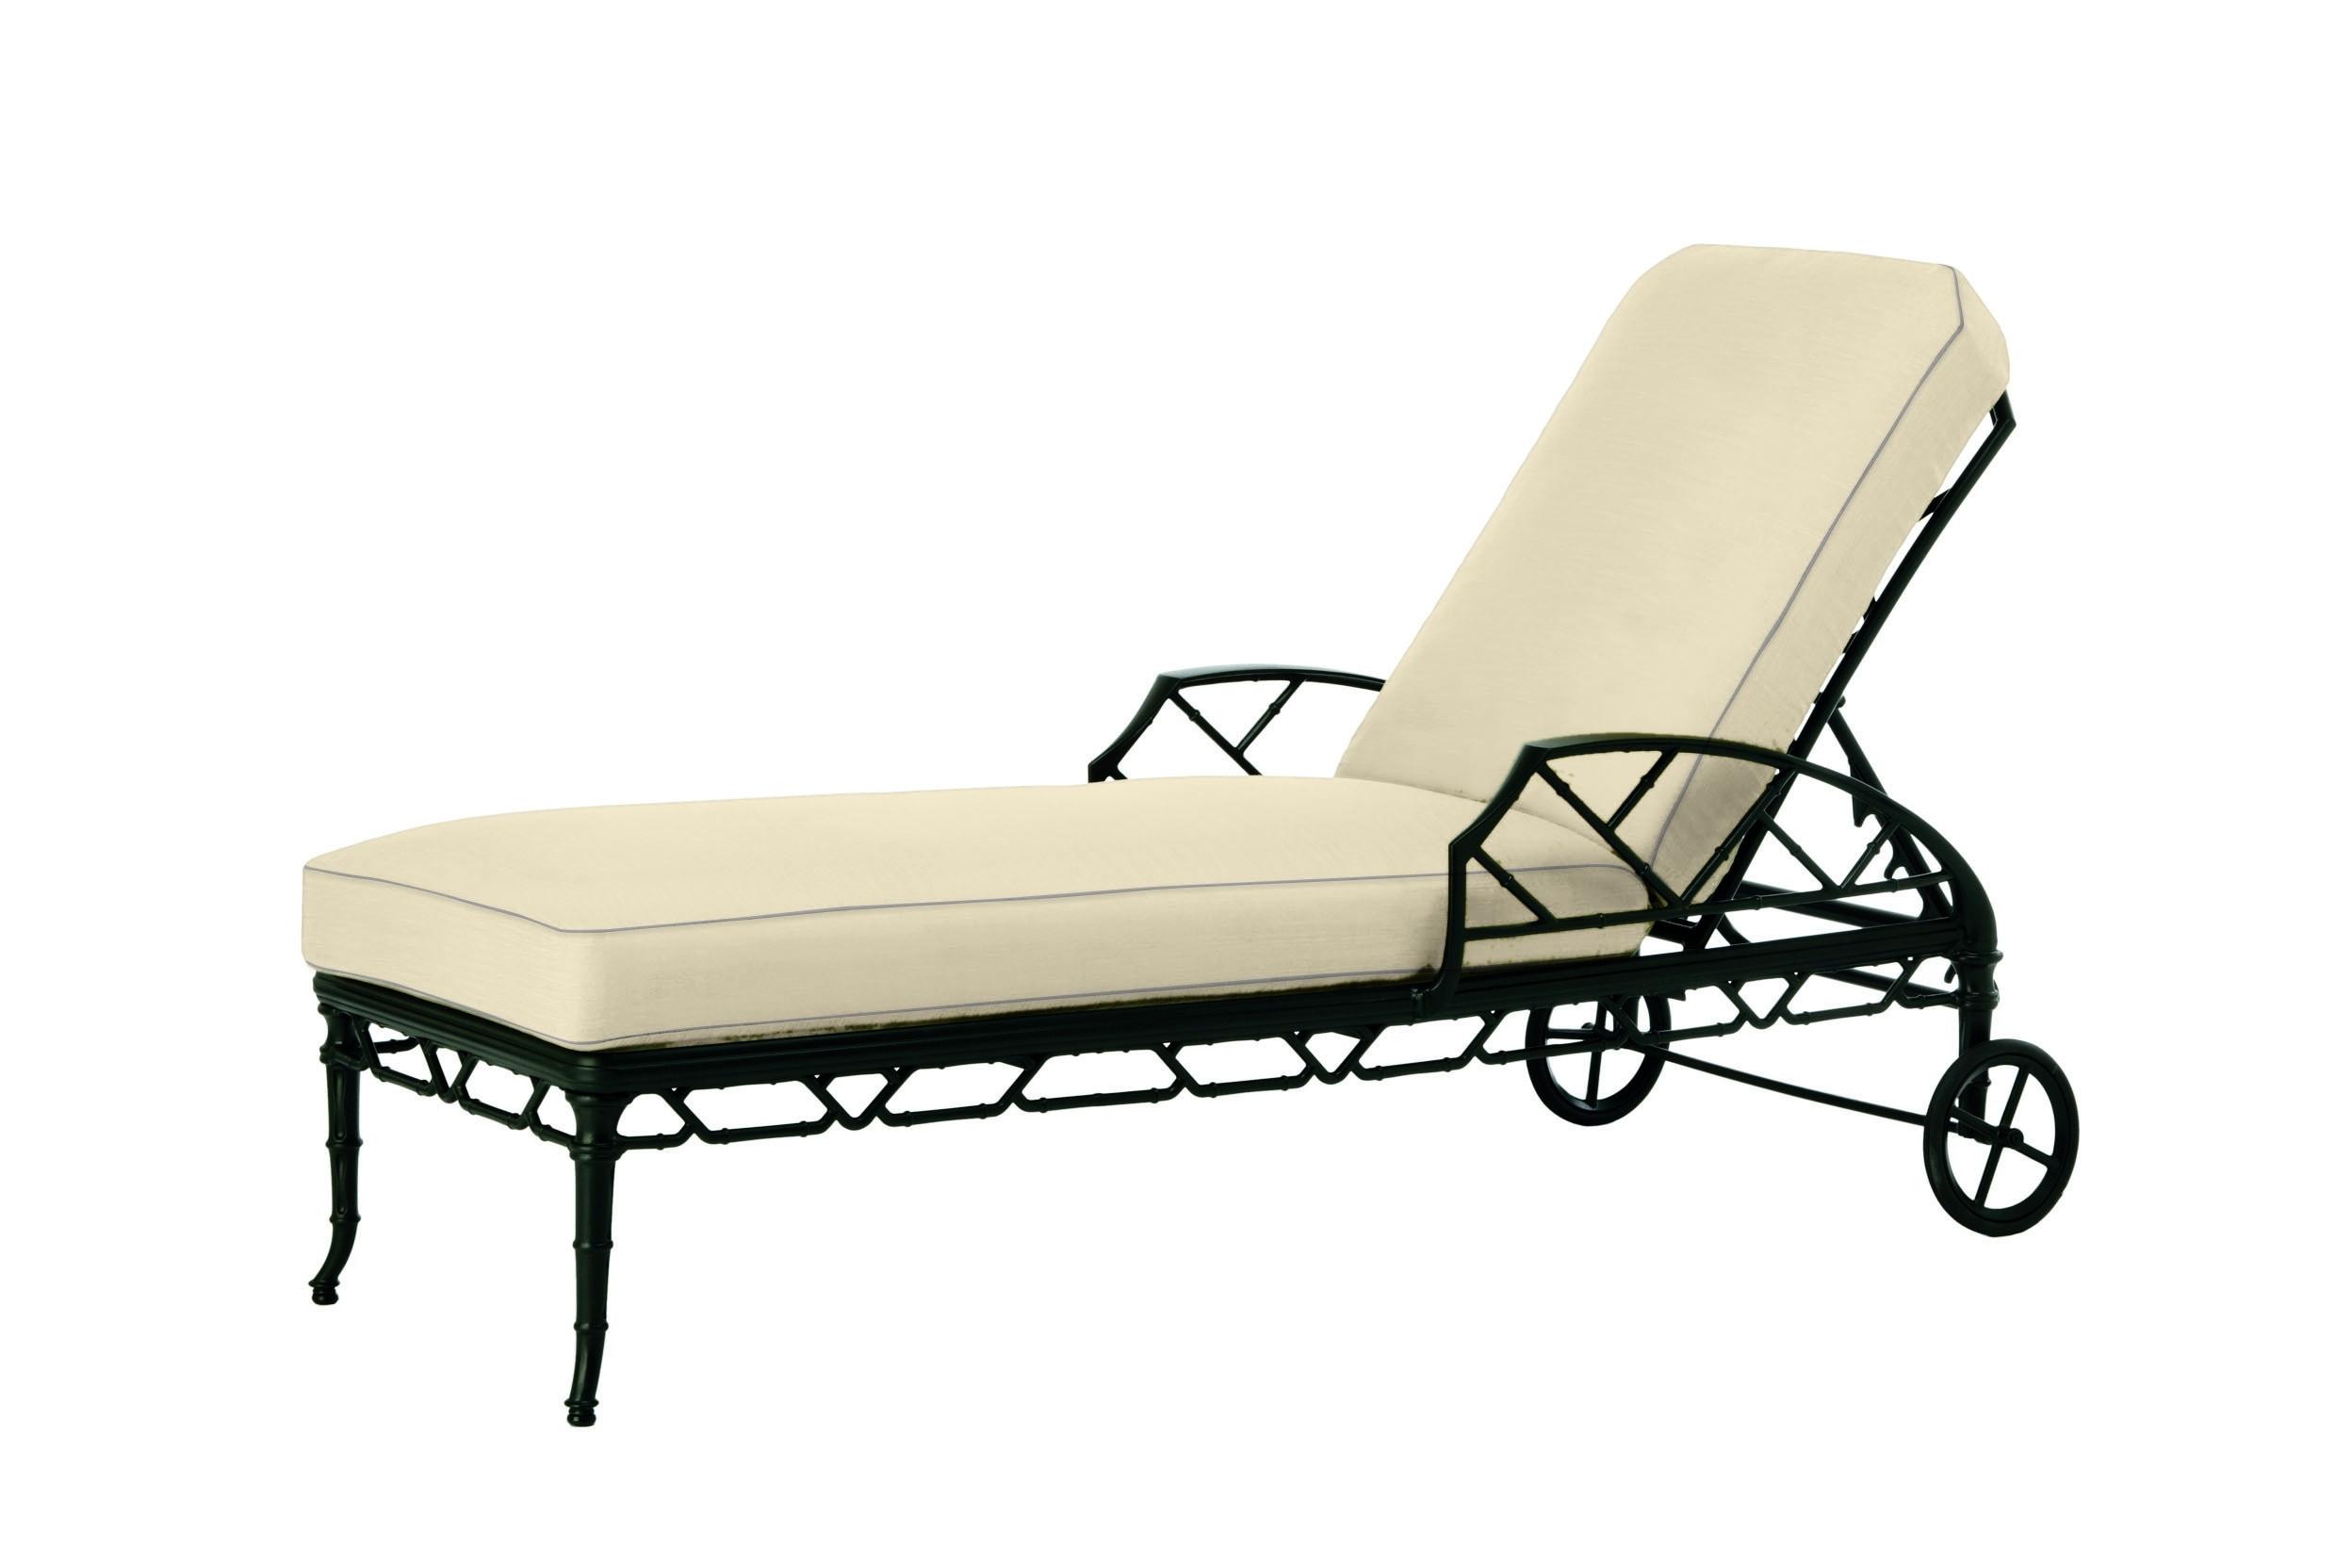 Lounge Chair : International Vintage Brown Jordan Patio Furniture With Regard To Popular Brown Jordan Chaises (View 9 of 15)